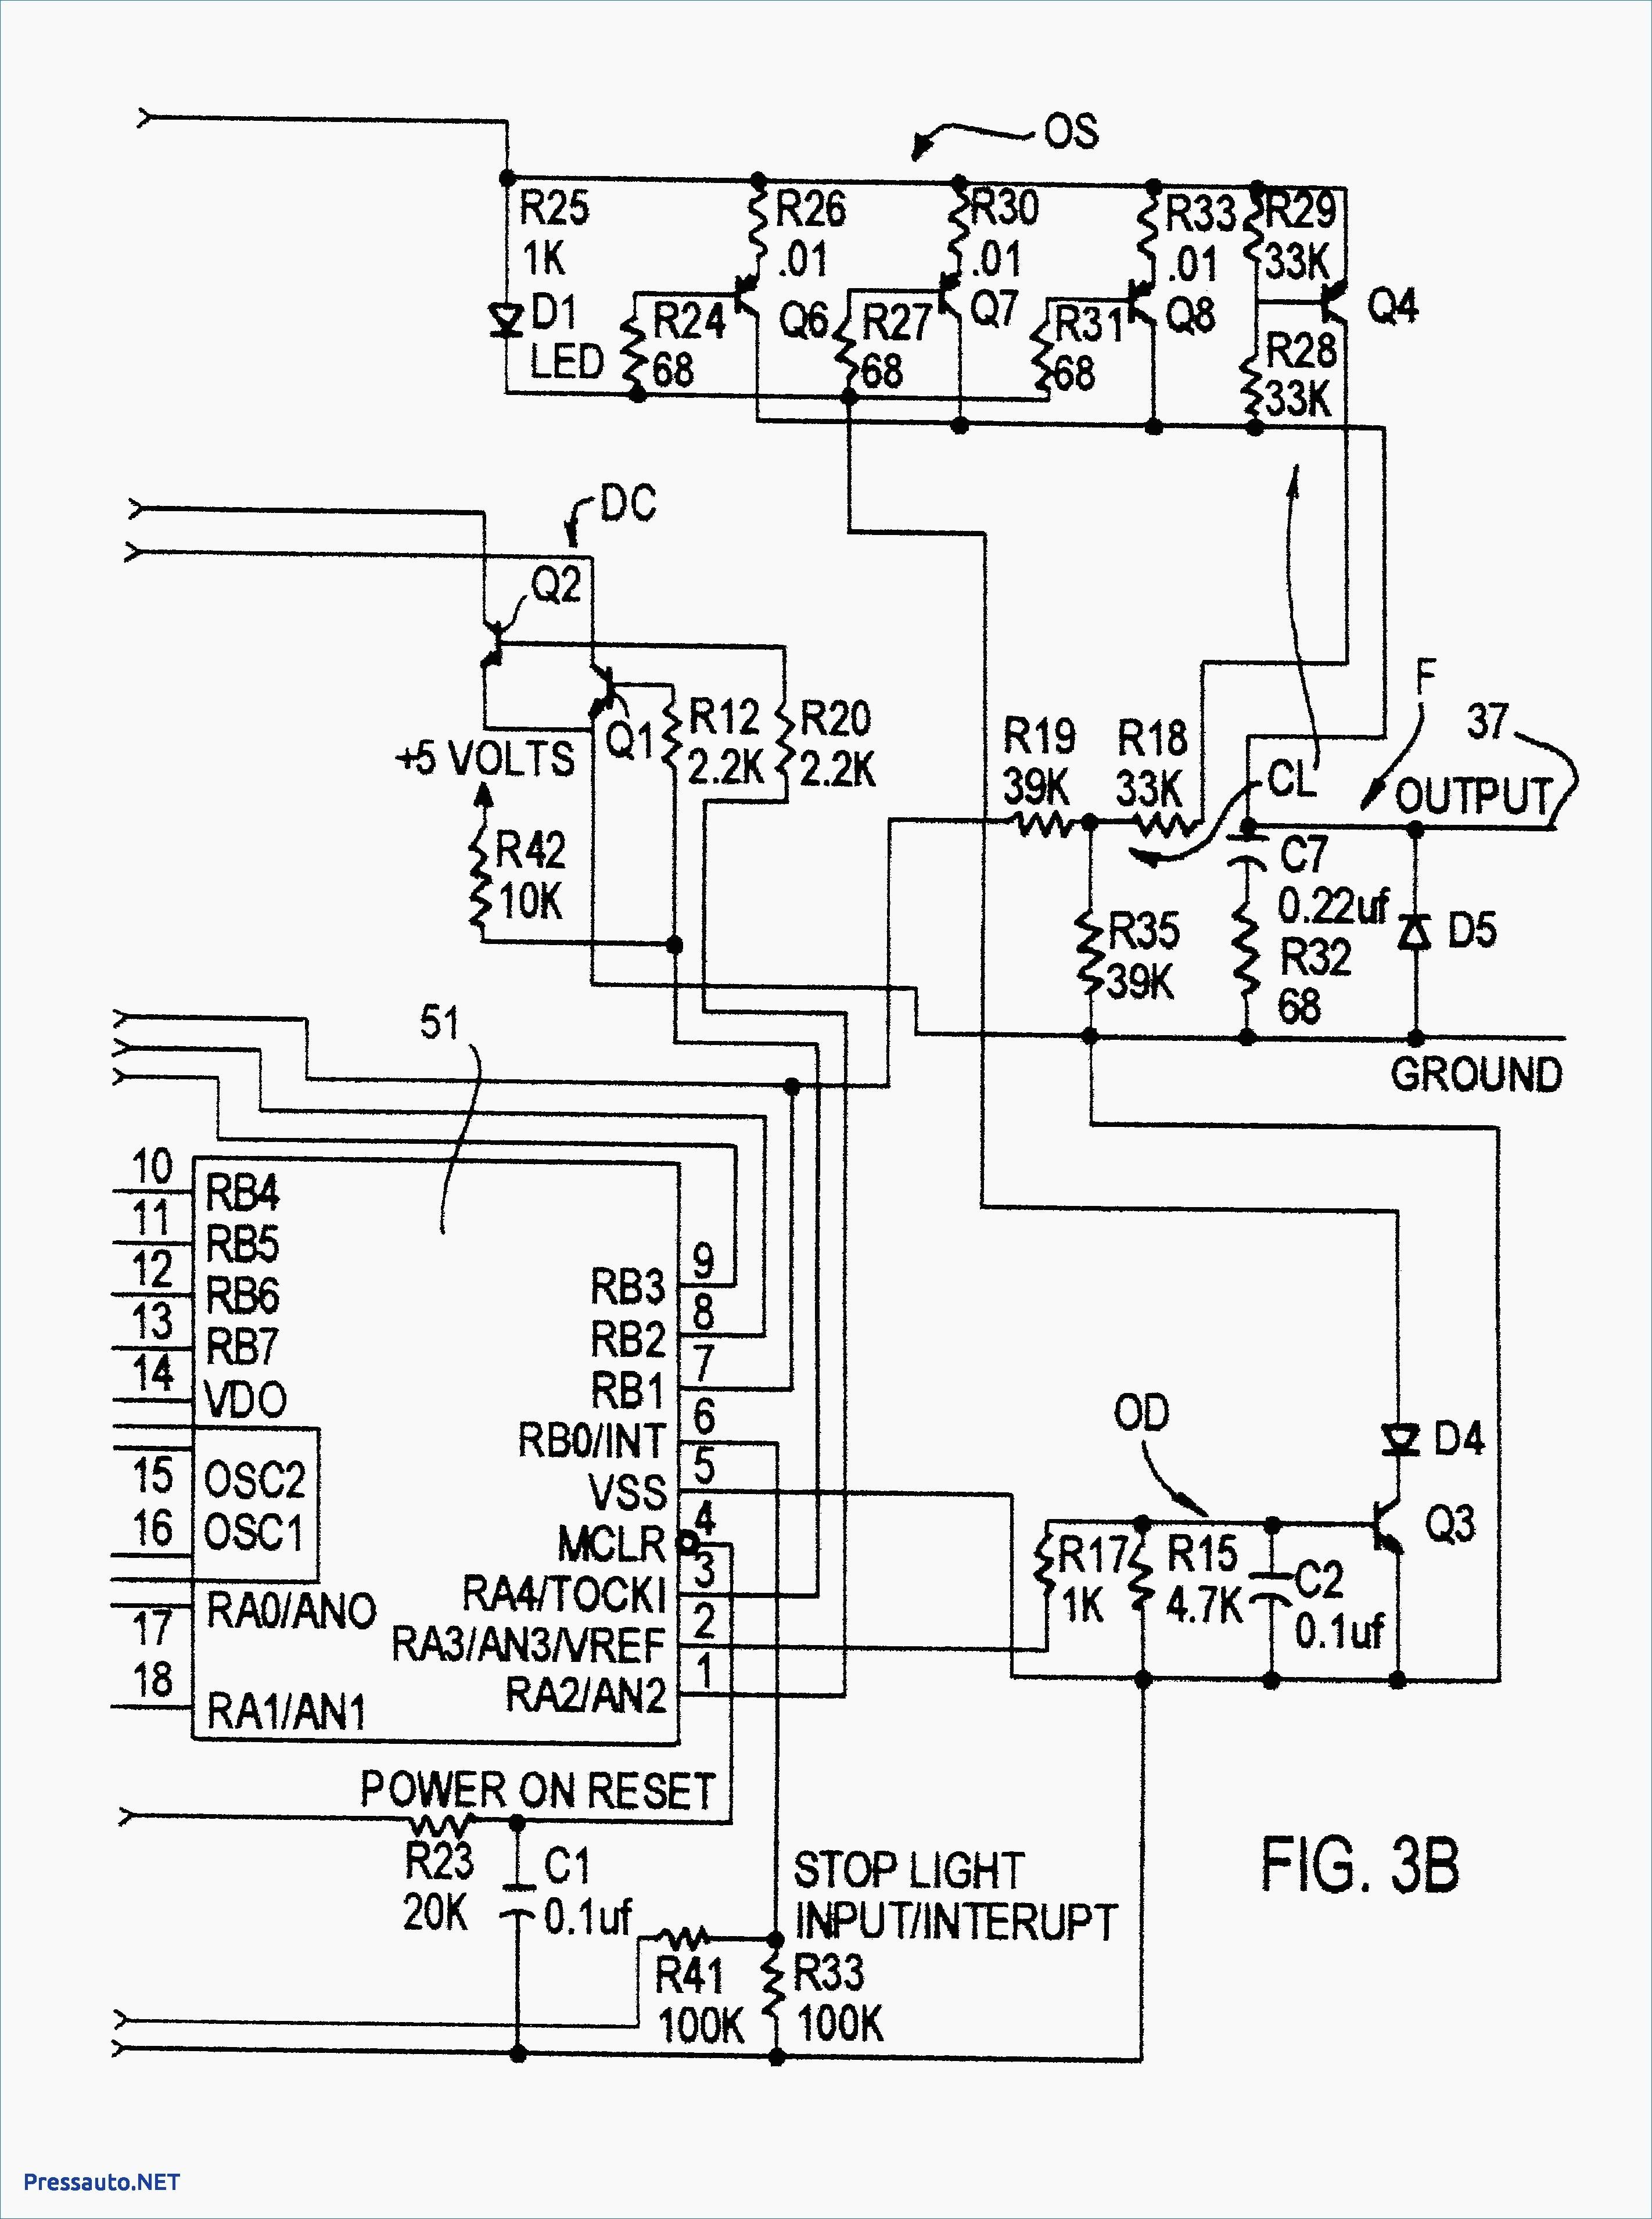 Utility Trailer Wiring Diagram originalstylophone